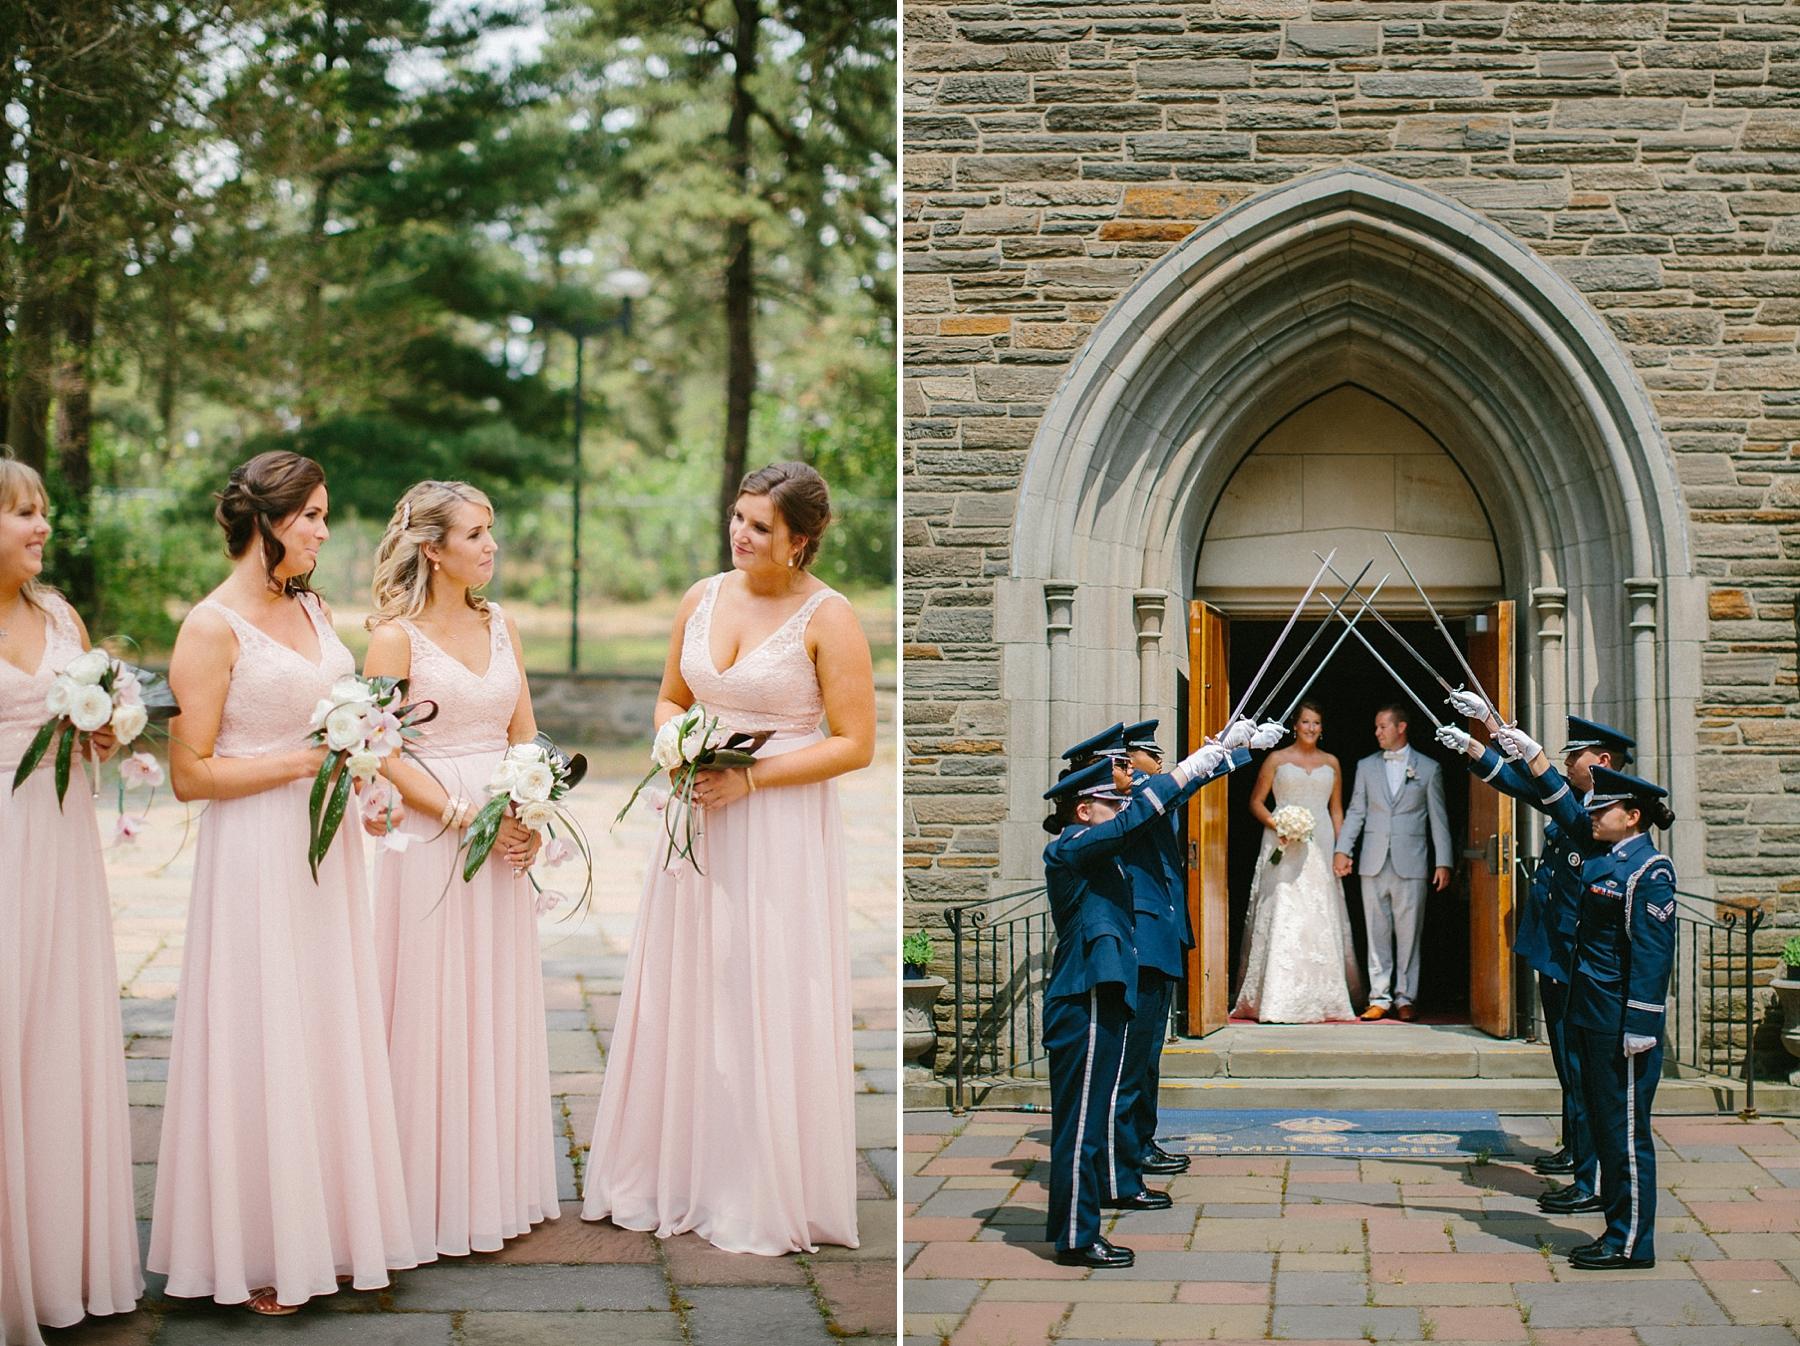 farm-wedding-engagement-session-destination-intimate_0028.jpg